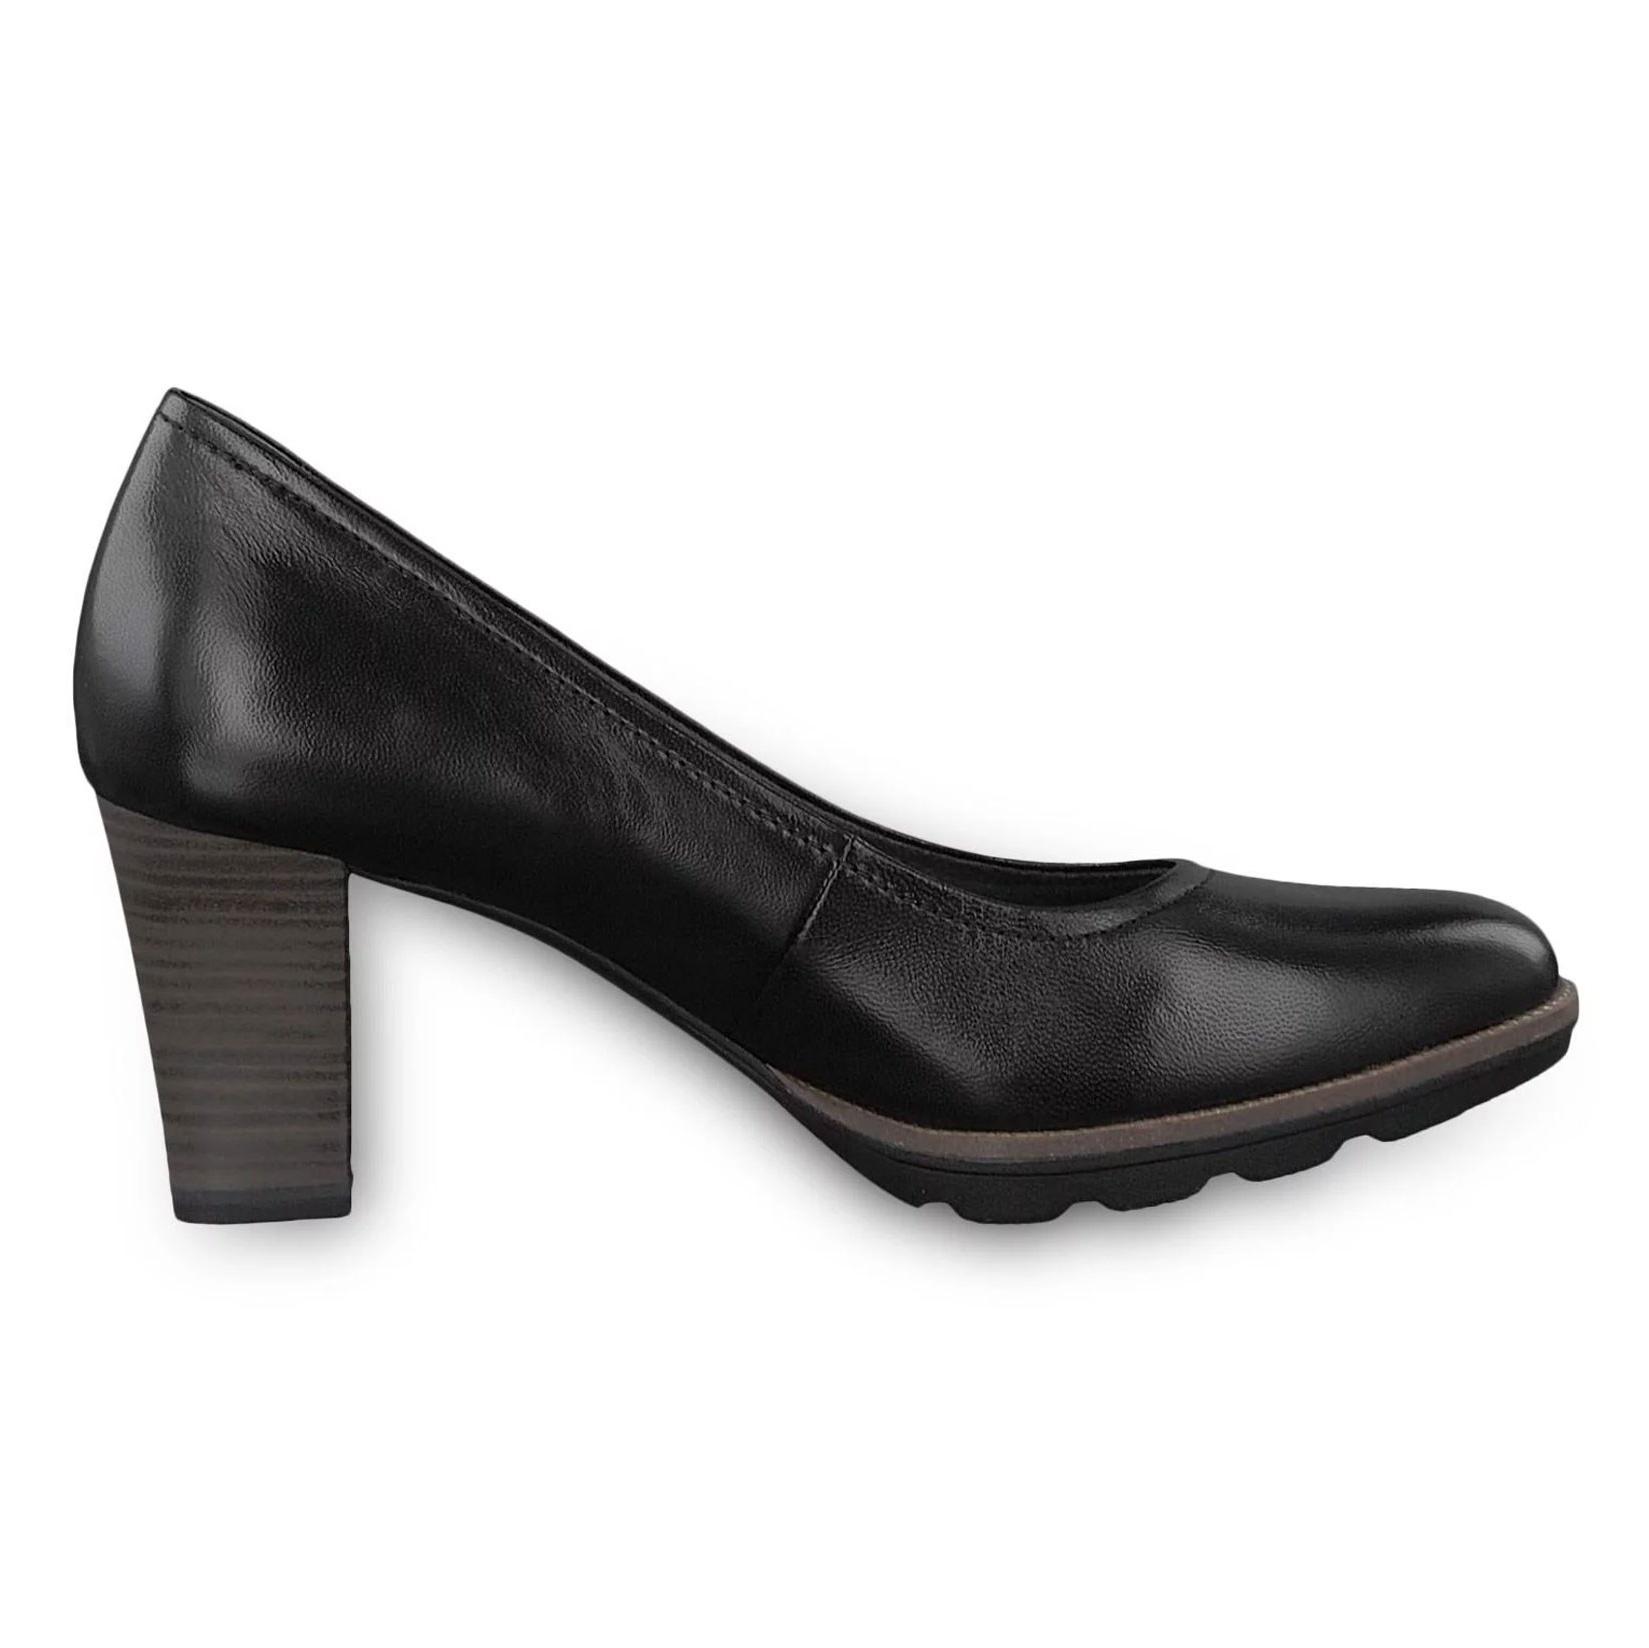 کفش پاشنه بلند چرم زنانه Fee - تاماریس